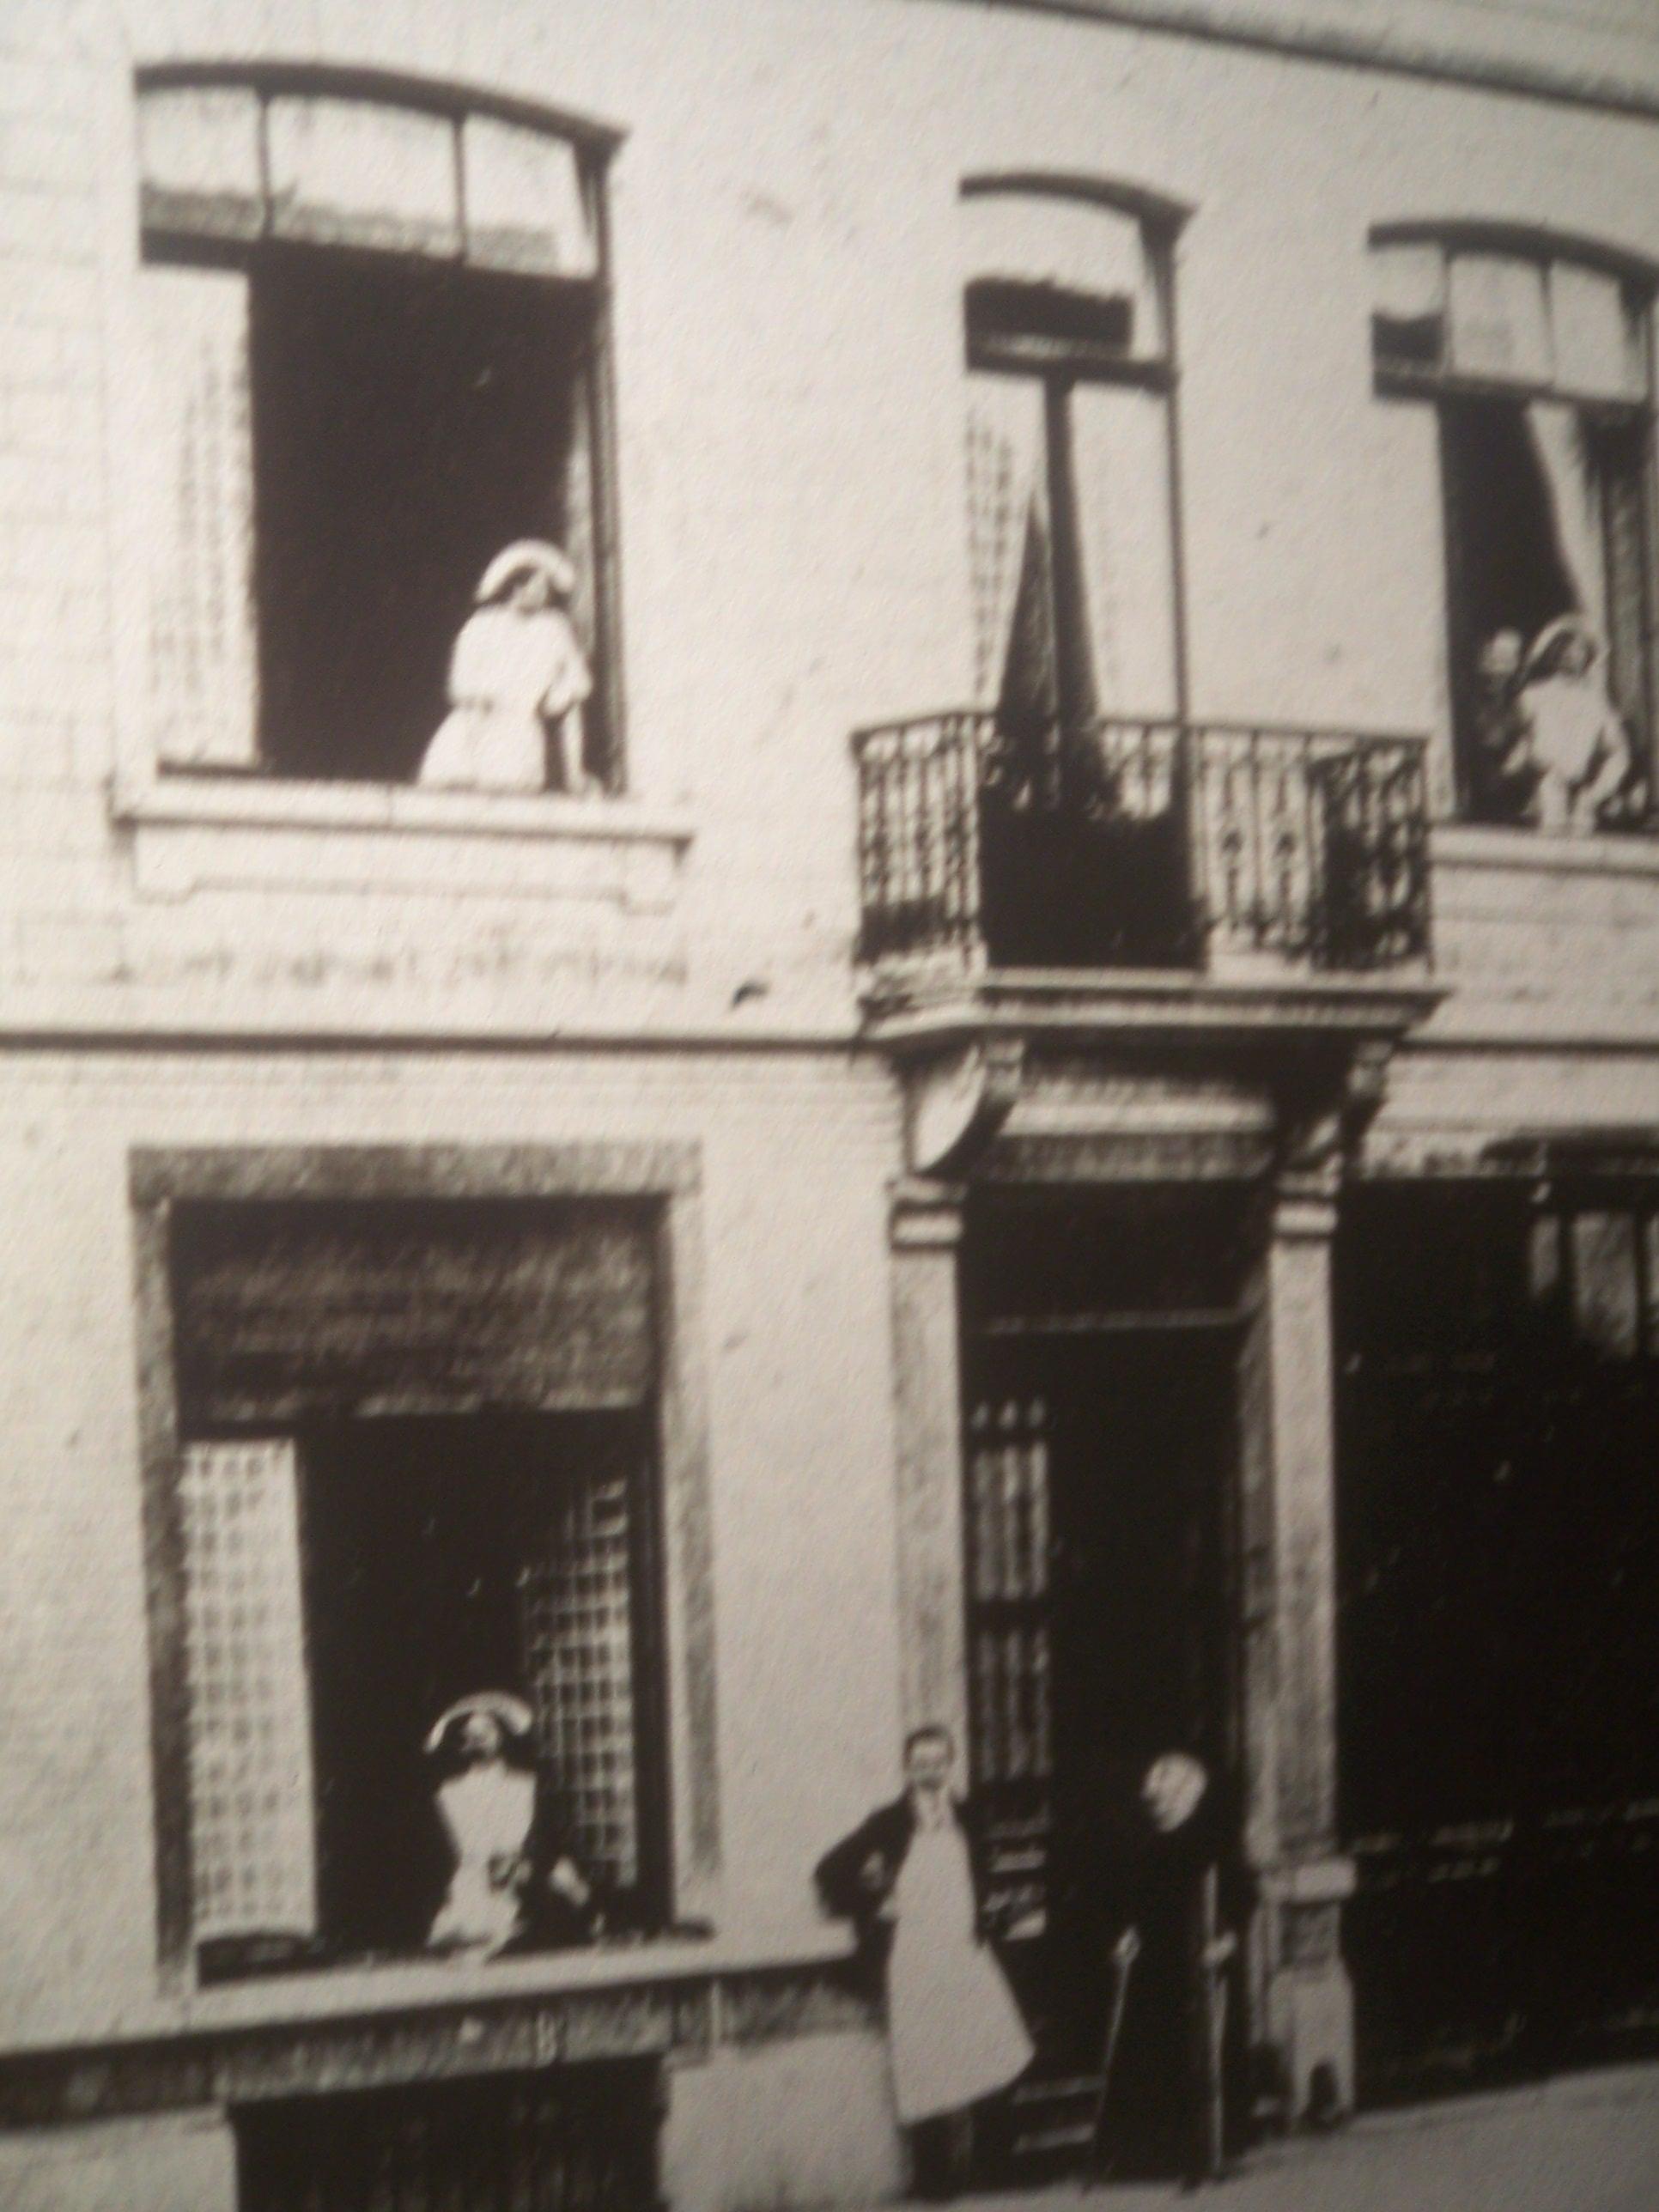 Early Image of Nursing School